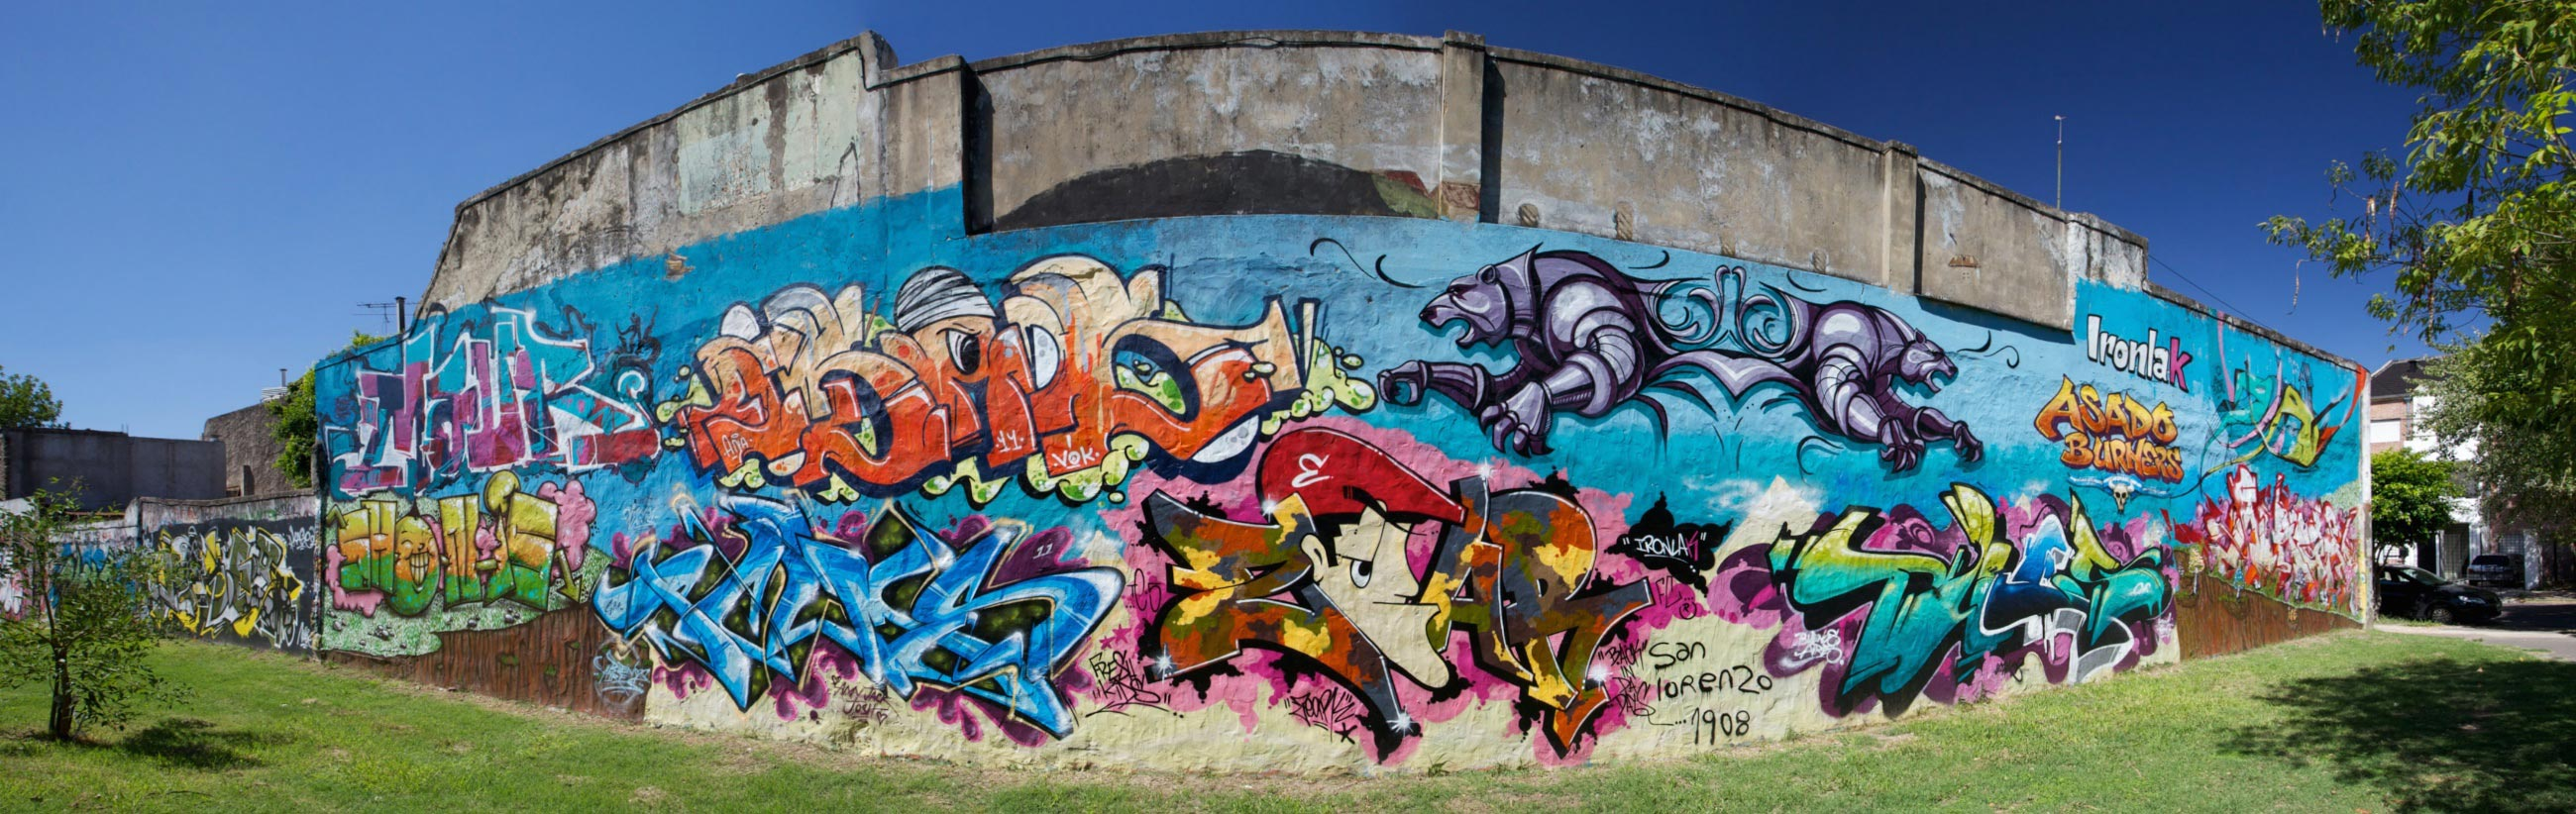 streetart-front